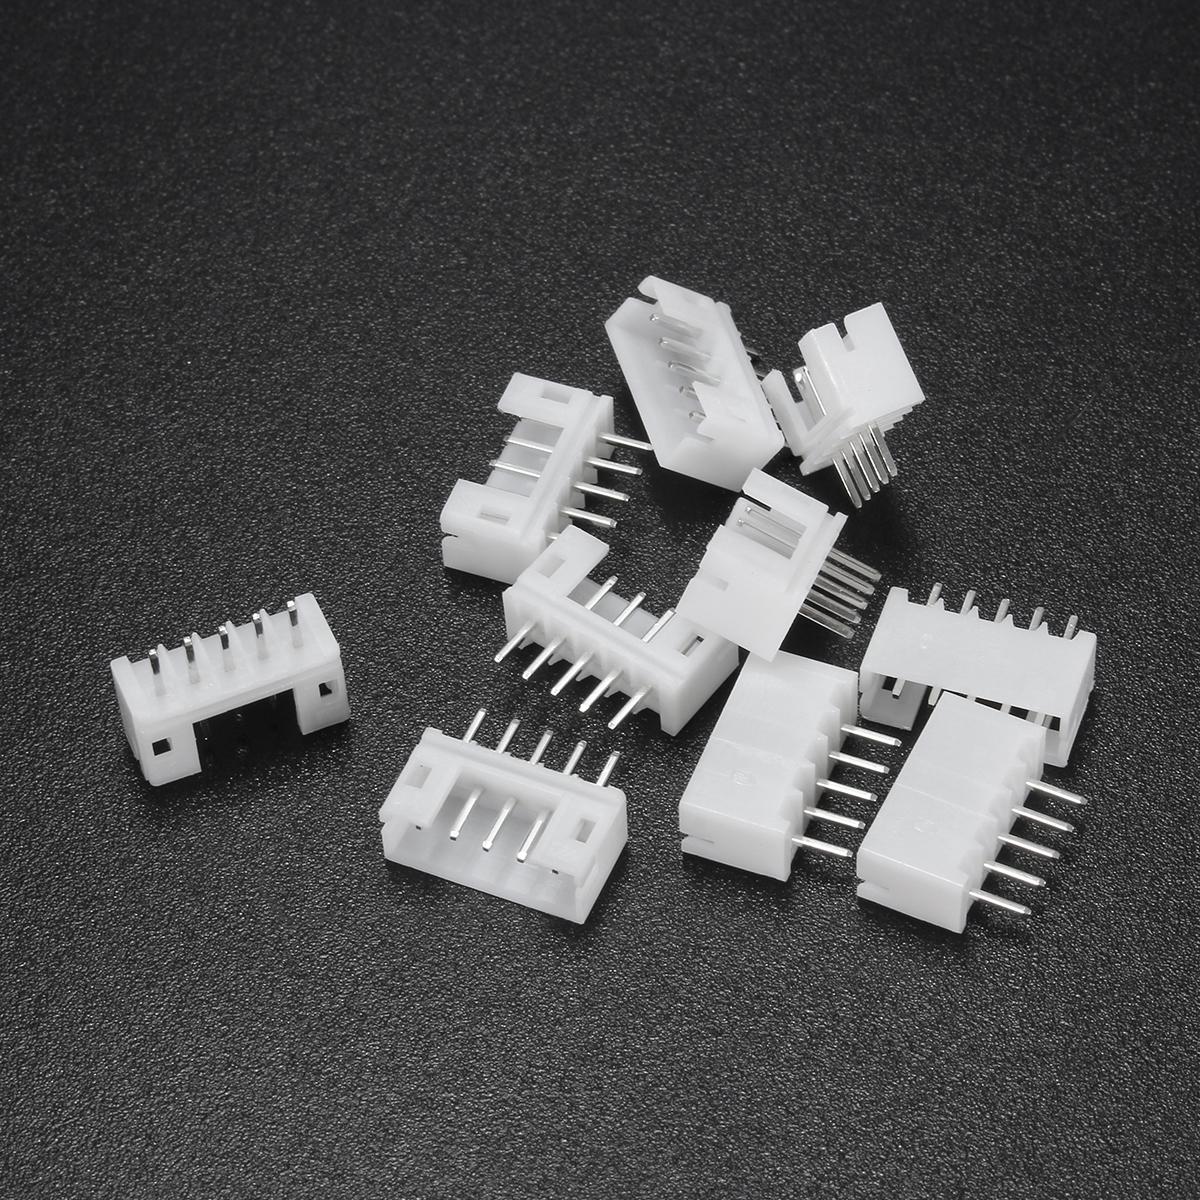 10pcs Mini Micro Jst 2 0 Ph 5pin Connector Plug With 30cm